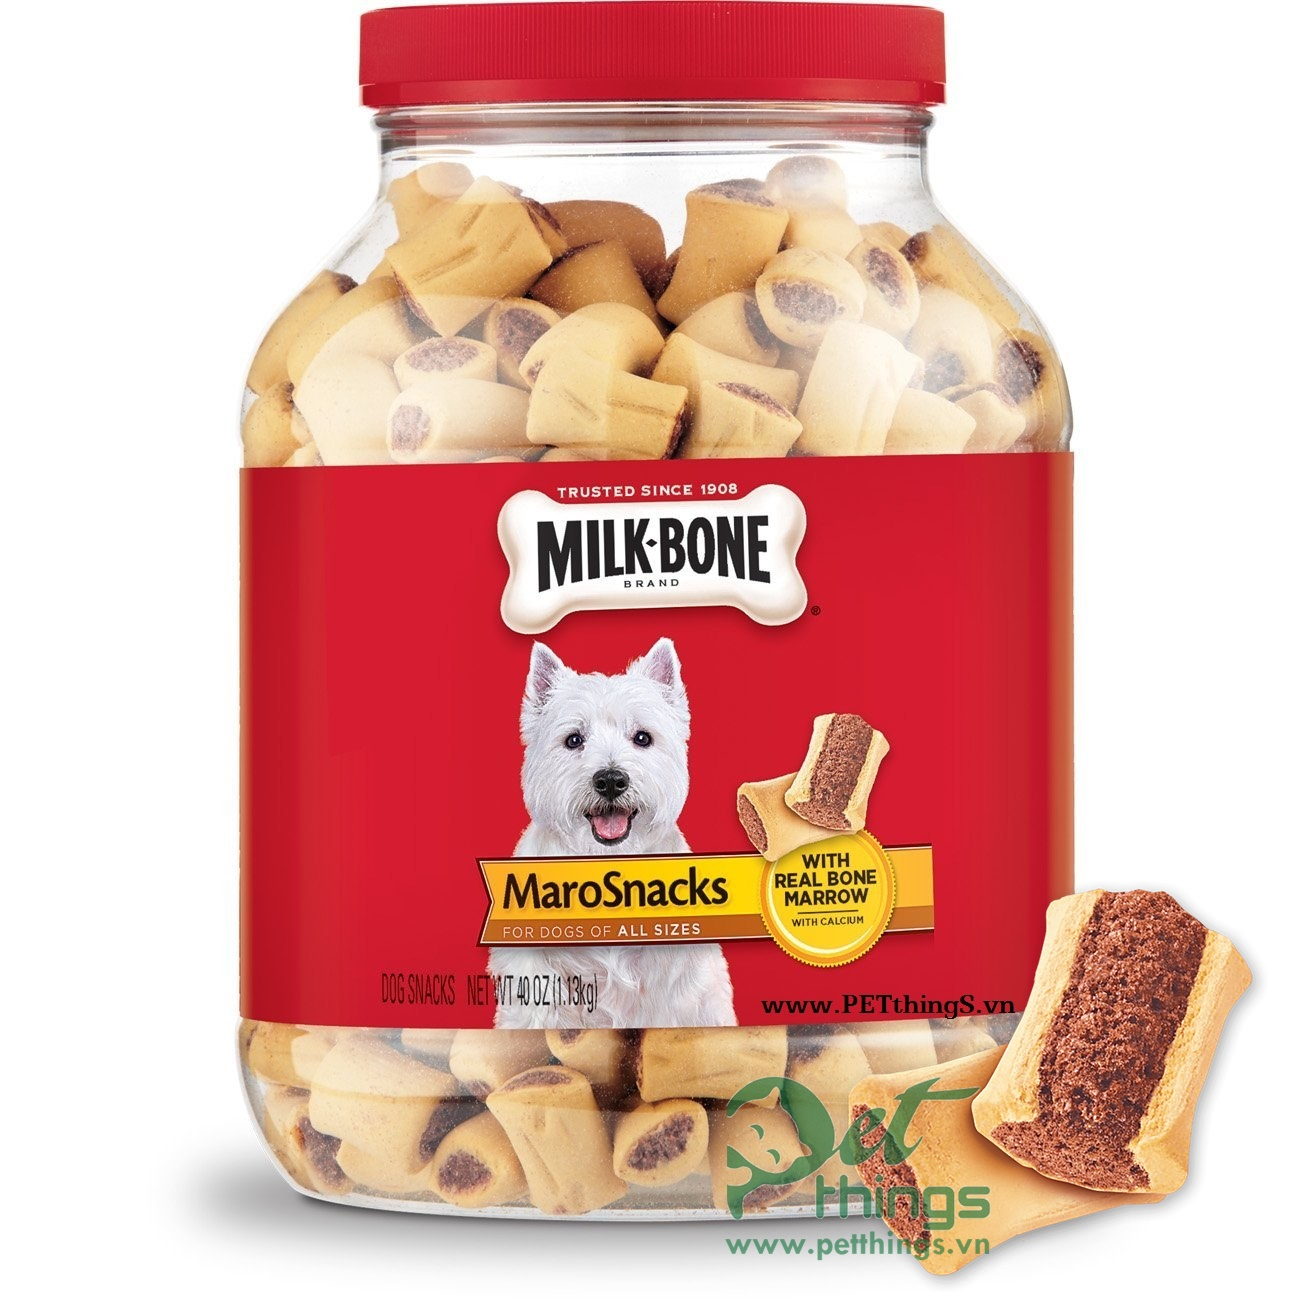 Milk-Bone MaroSnacks Dog Treats